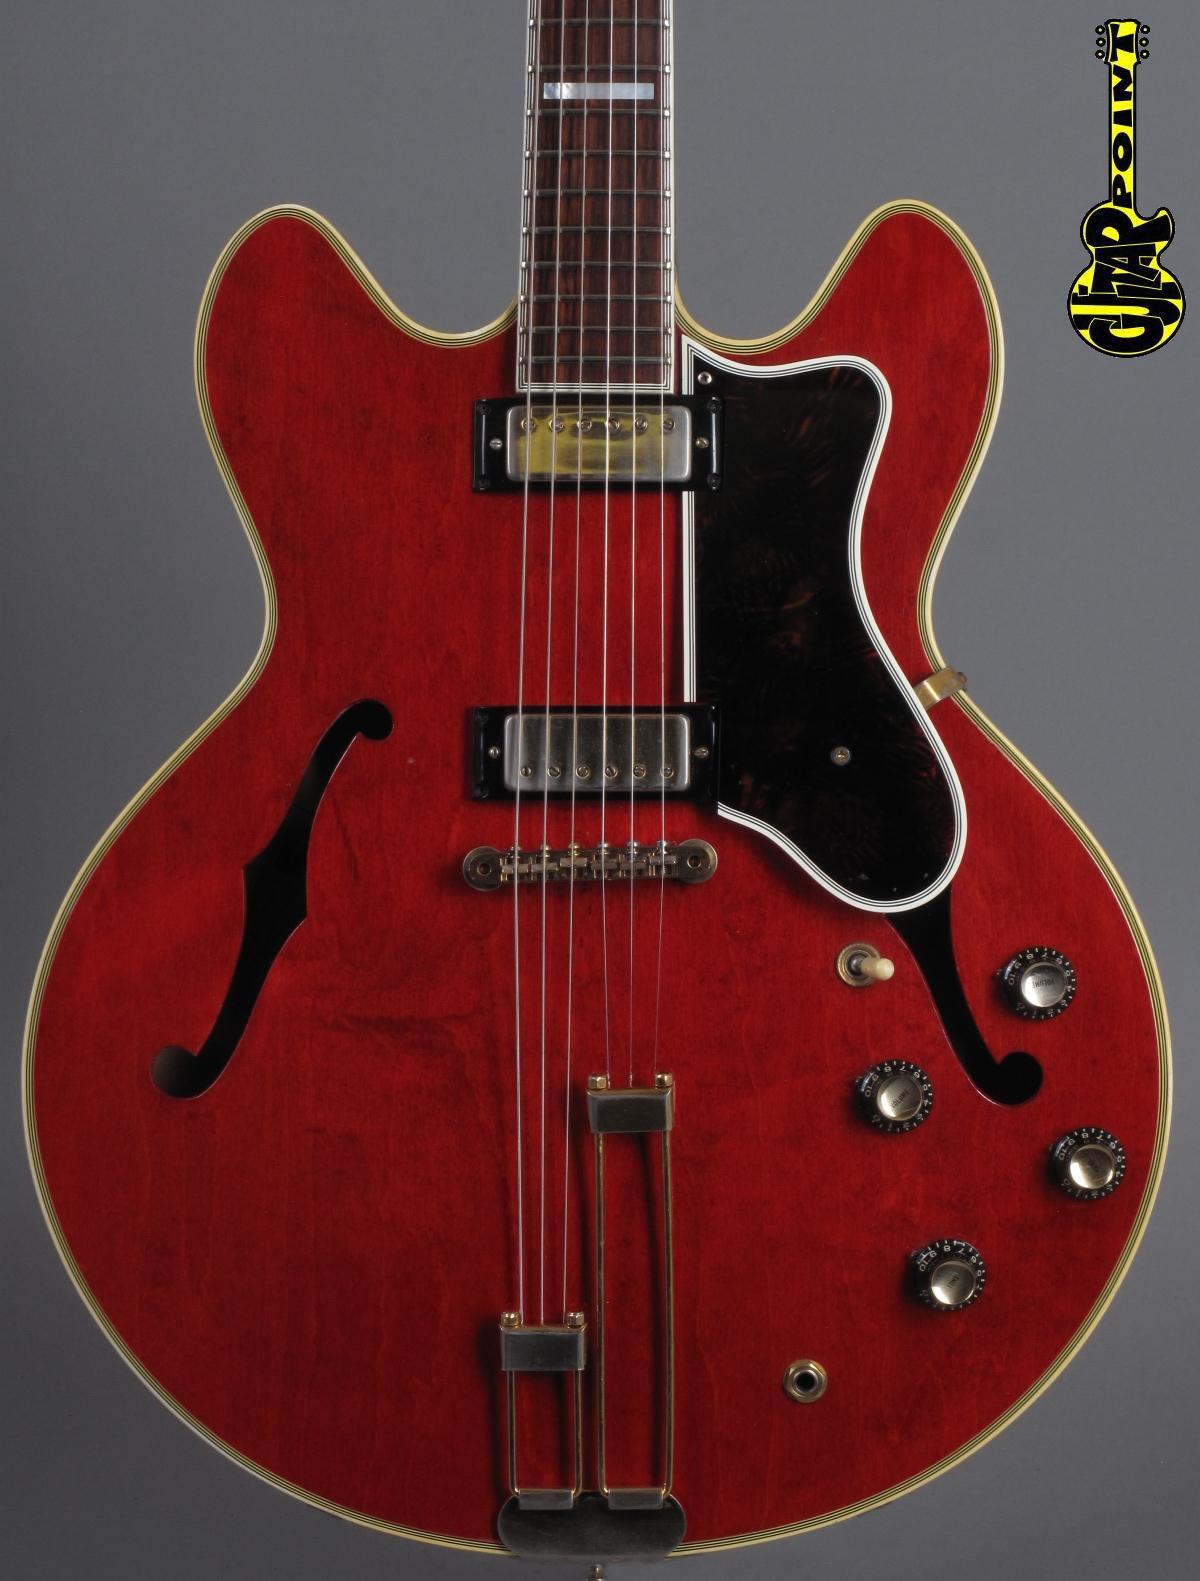 1967 Epiphone Sheraton E212T - Cherry